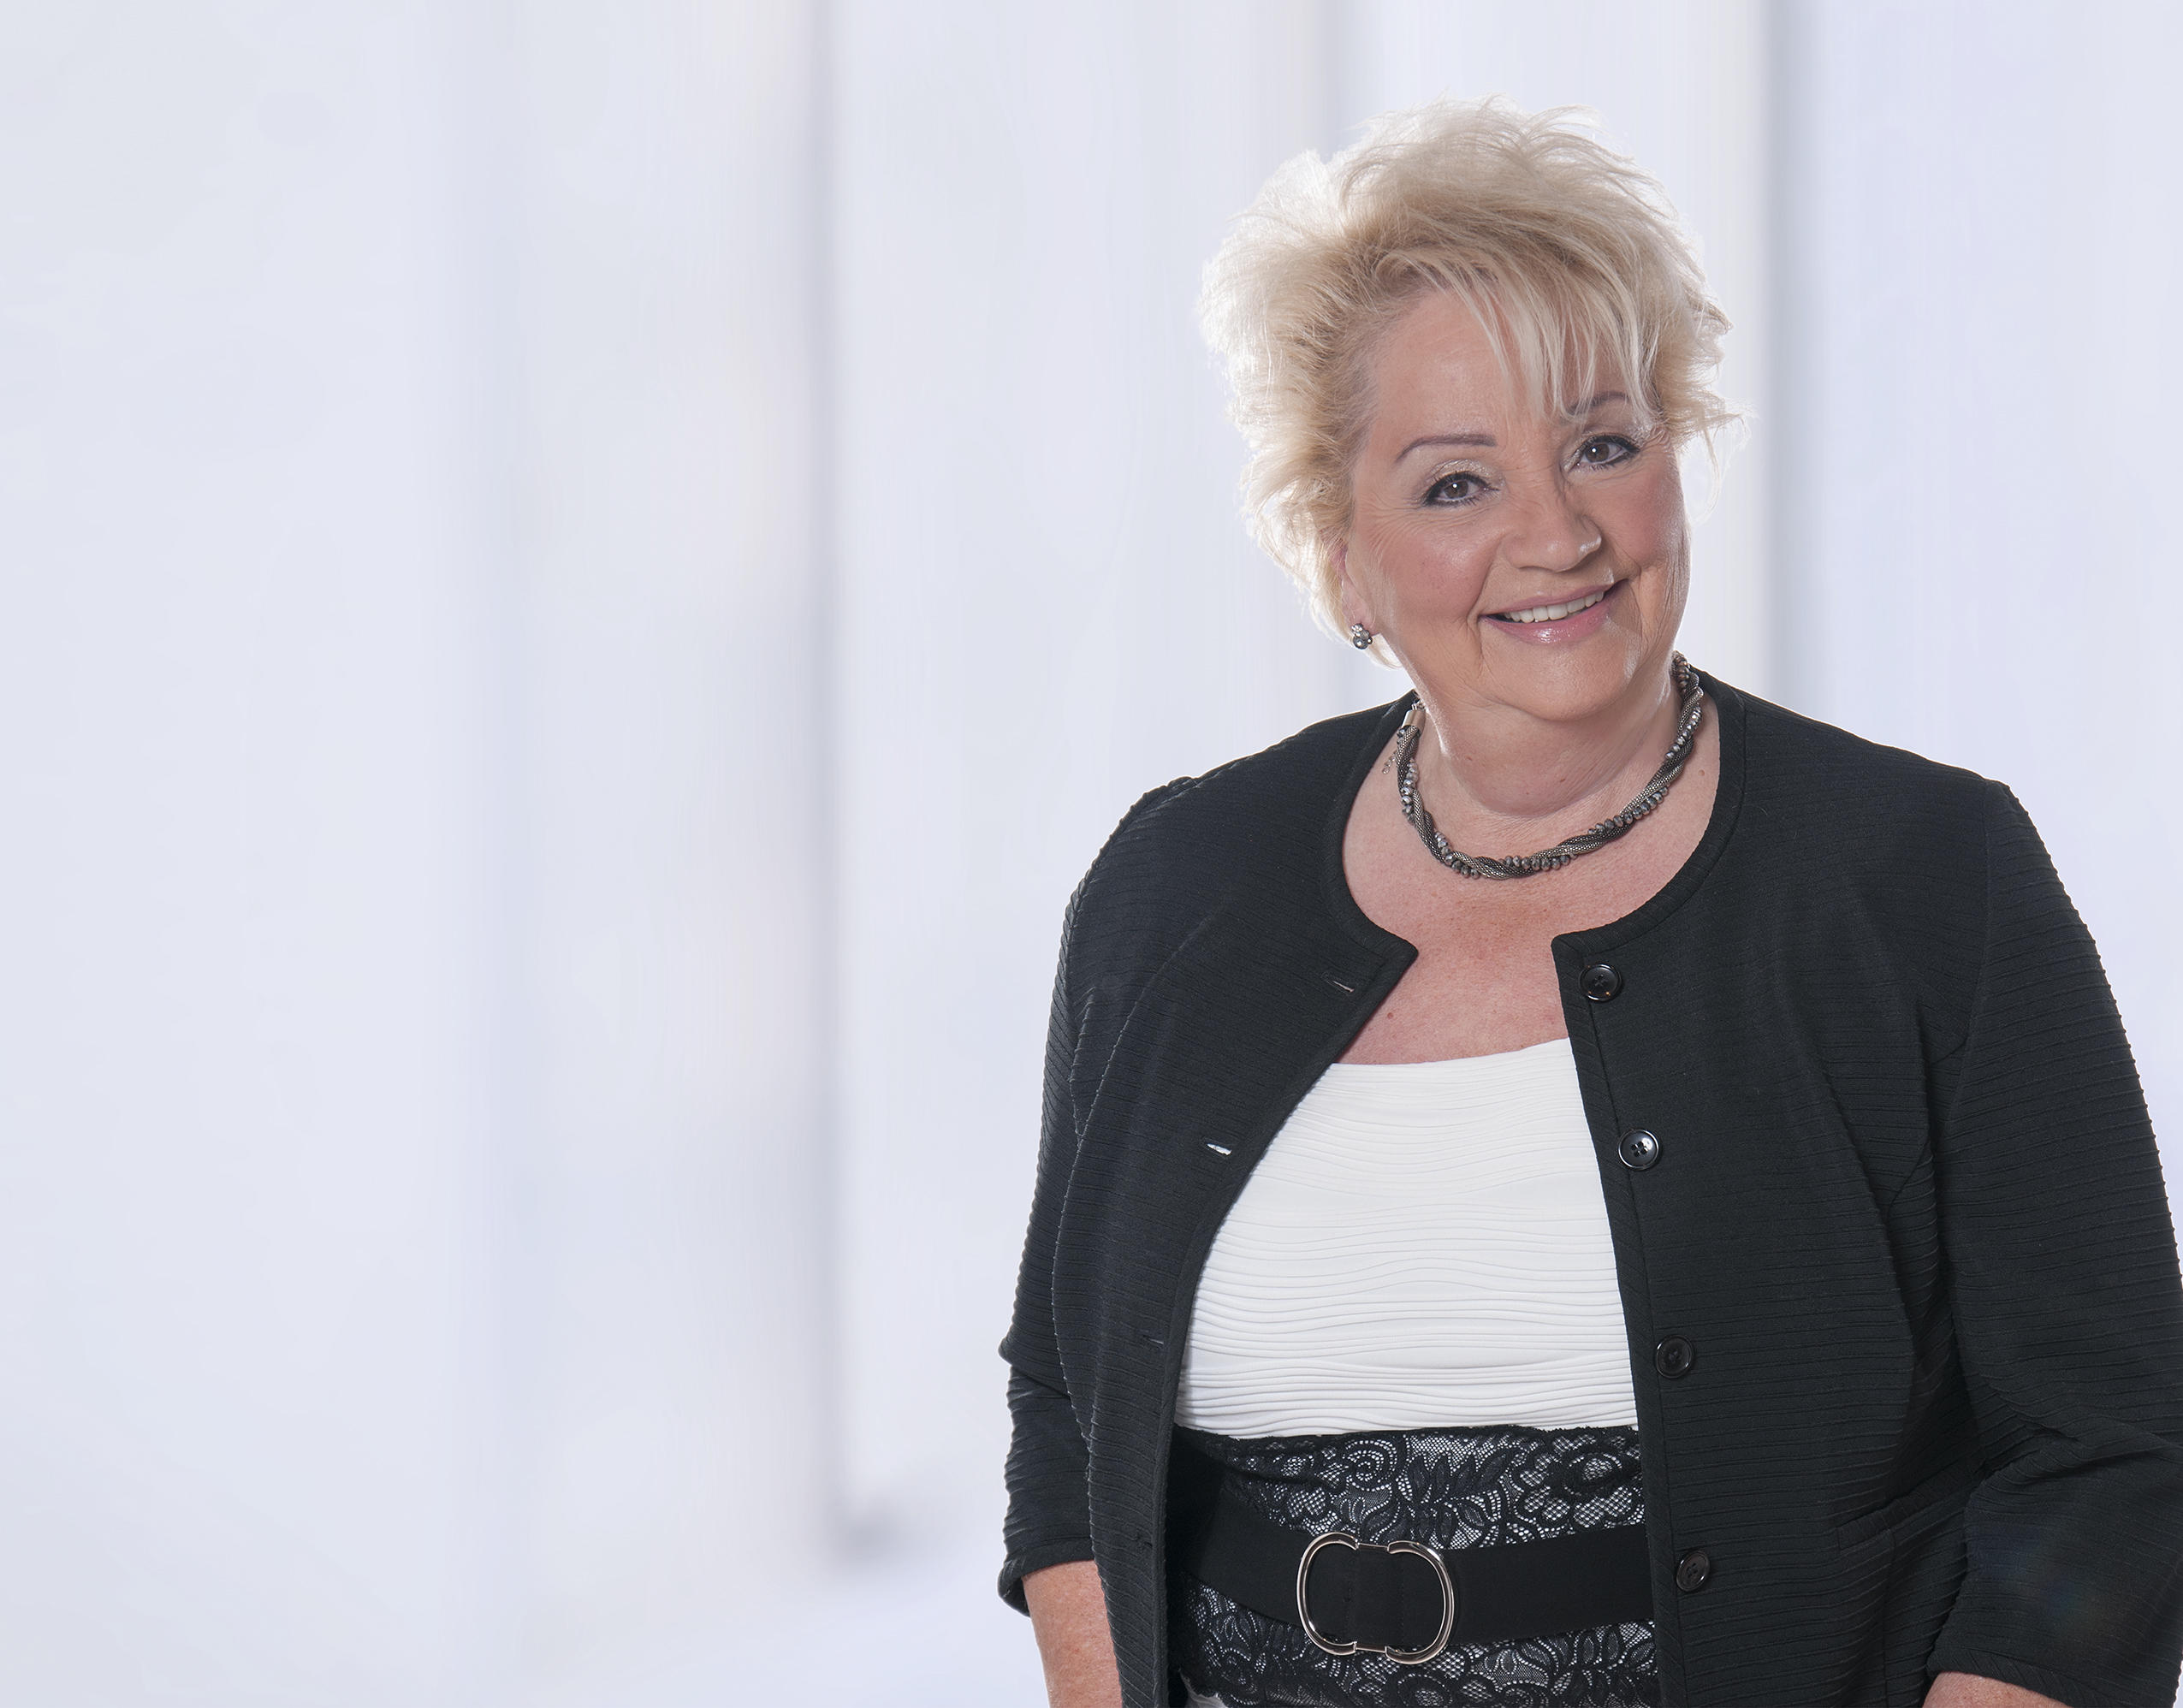 Barmenia Versicherung - Ursula Knoll